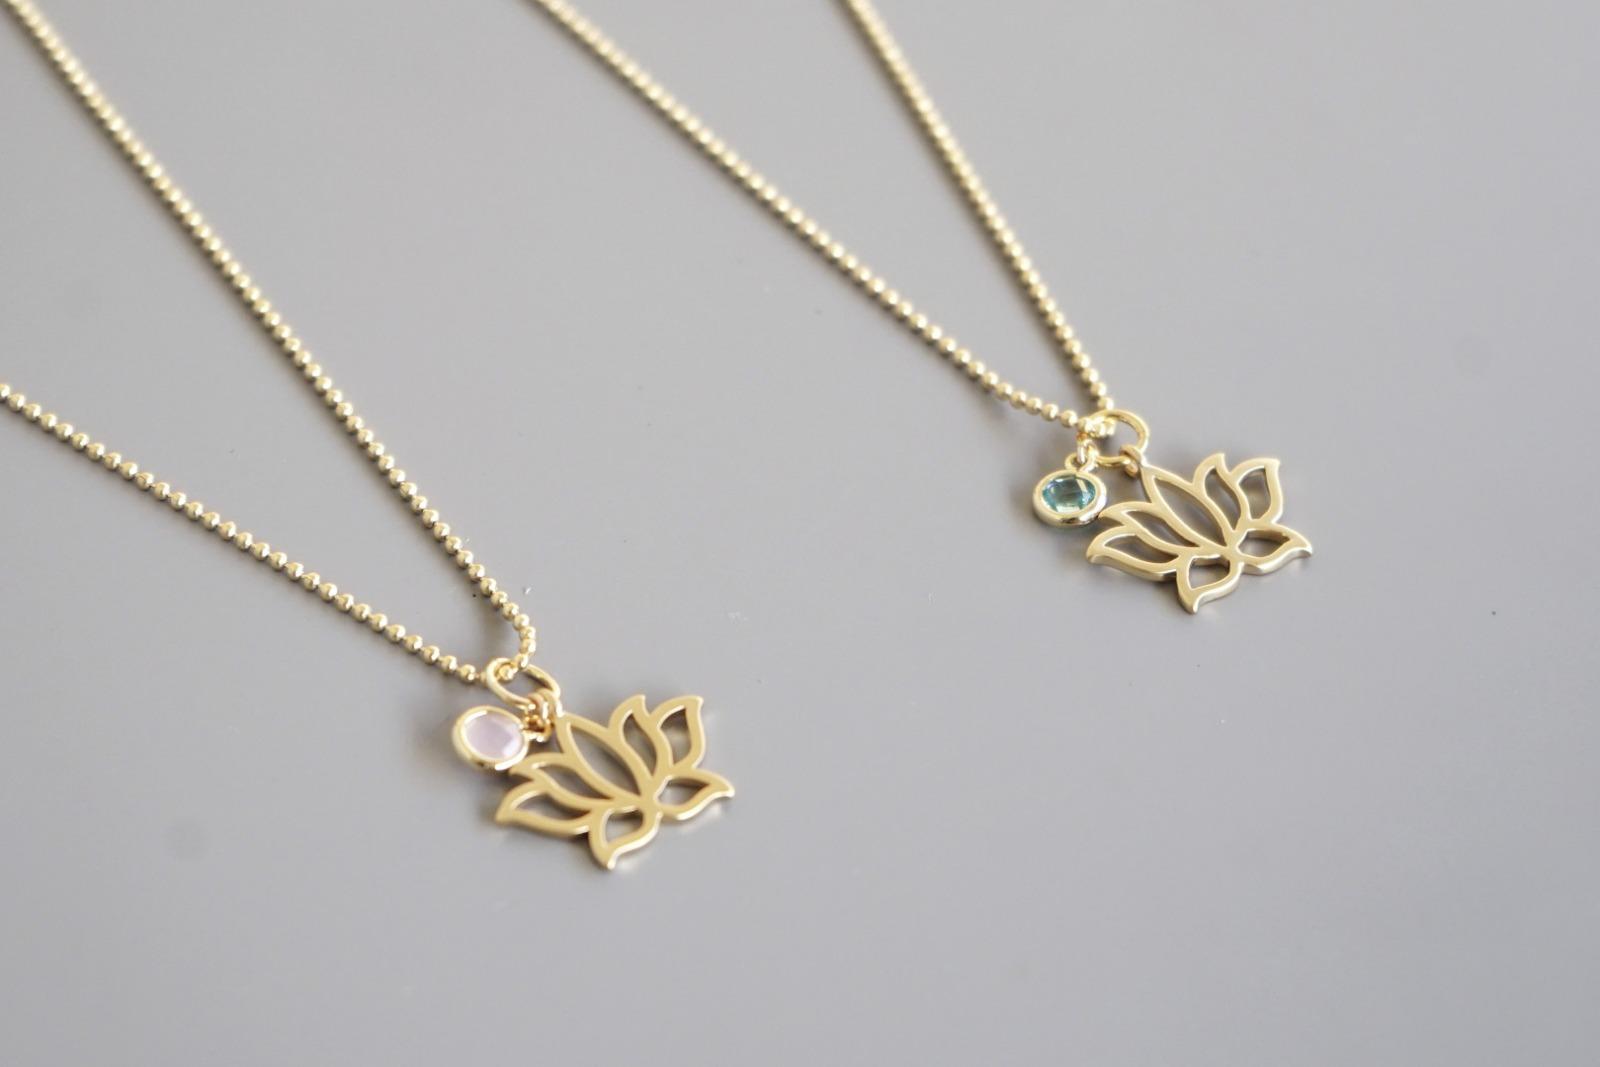 Kugelkette mit Lotusblüte und Kristall türkis - 3